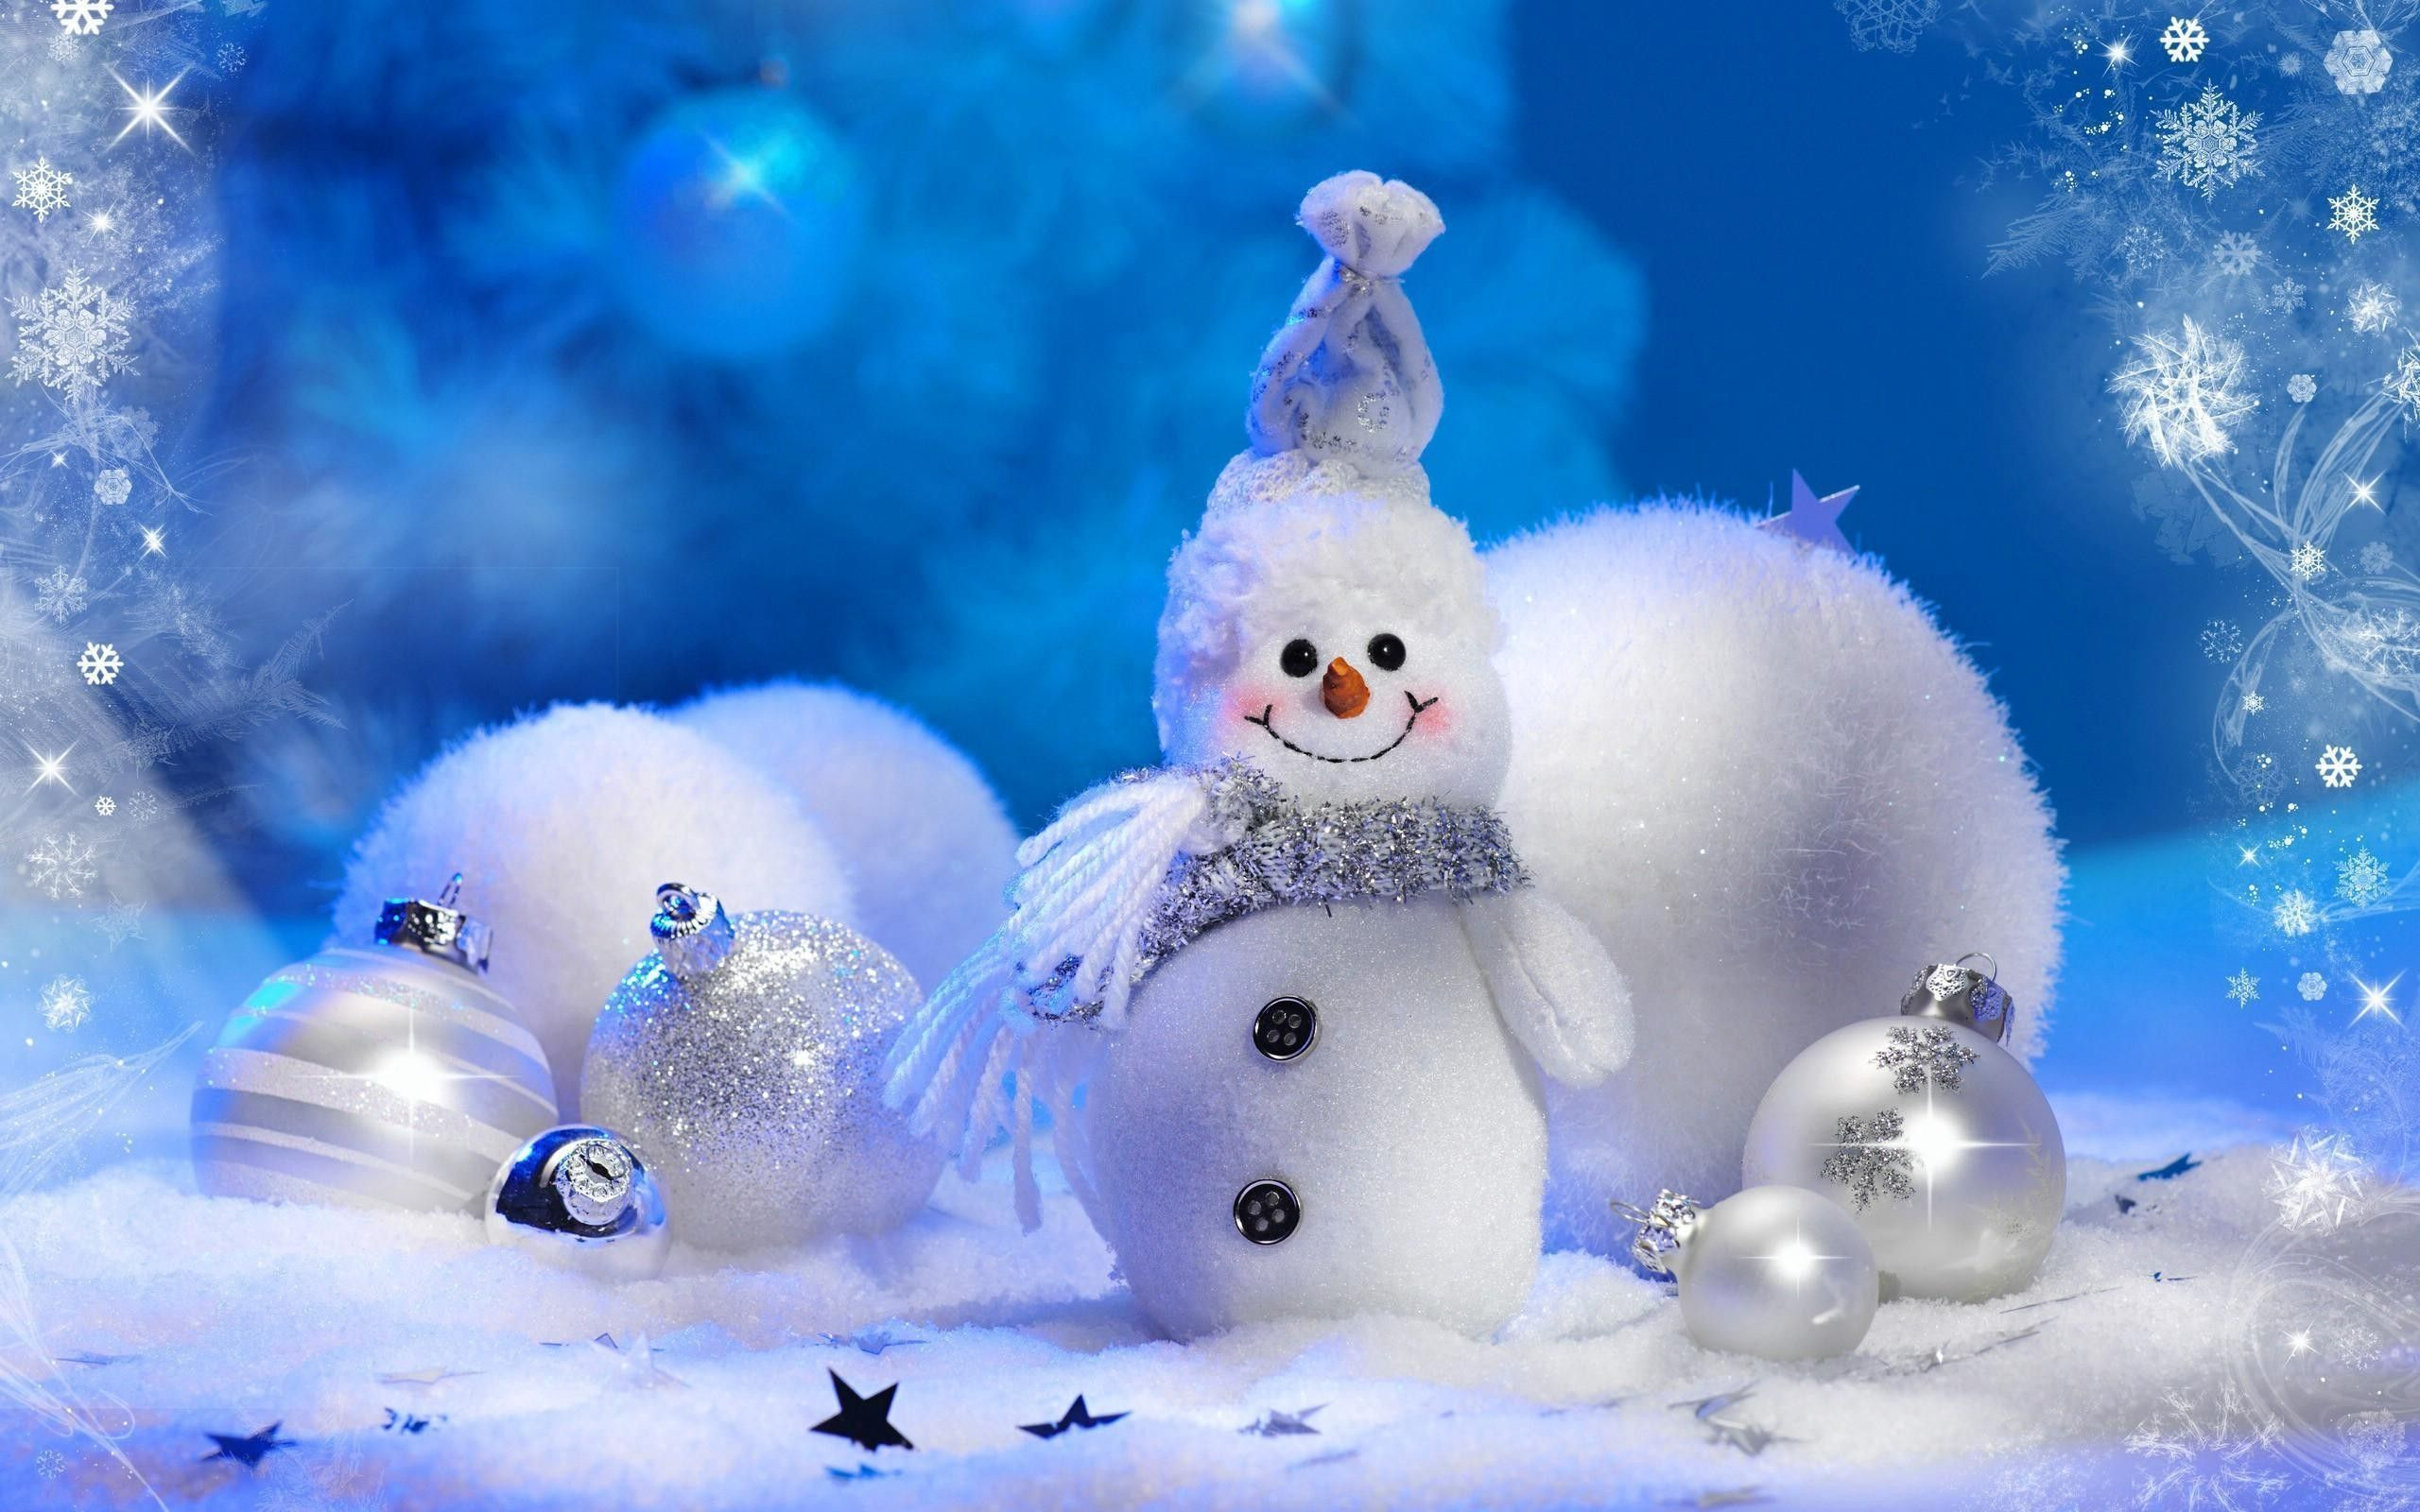 Winter Christmas Photos Pindelphina King On Merry Christmas  Pinterest  Snowman .